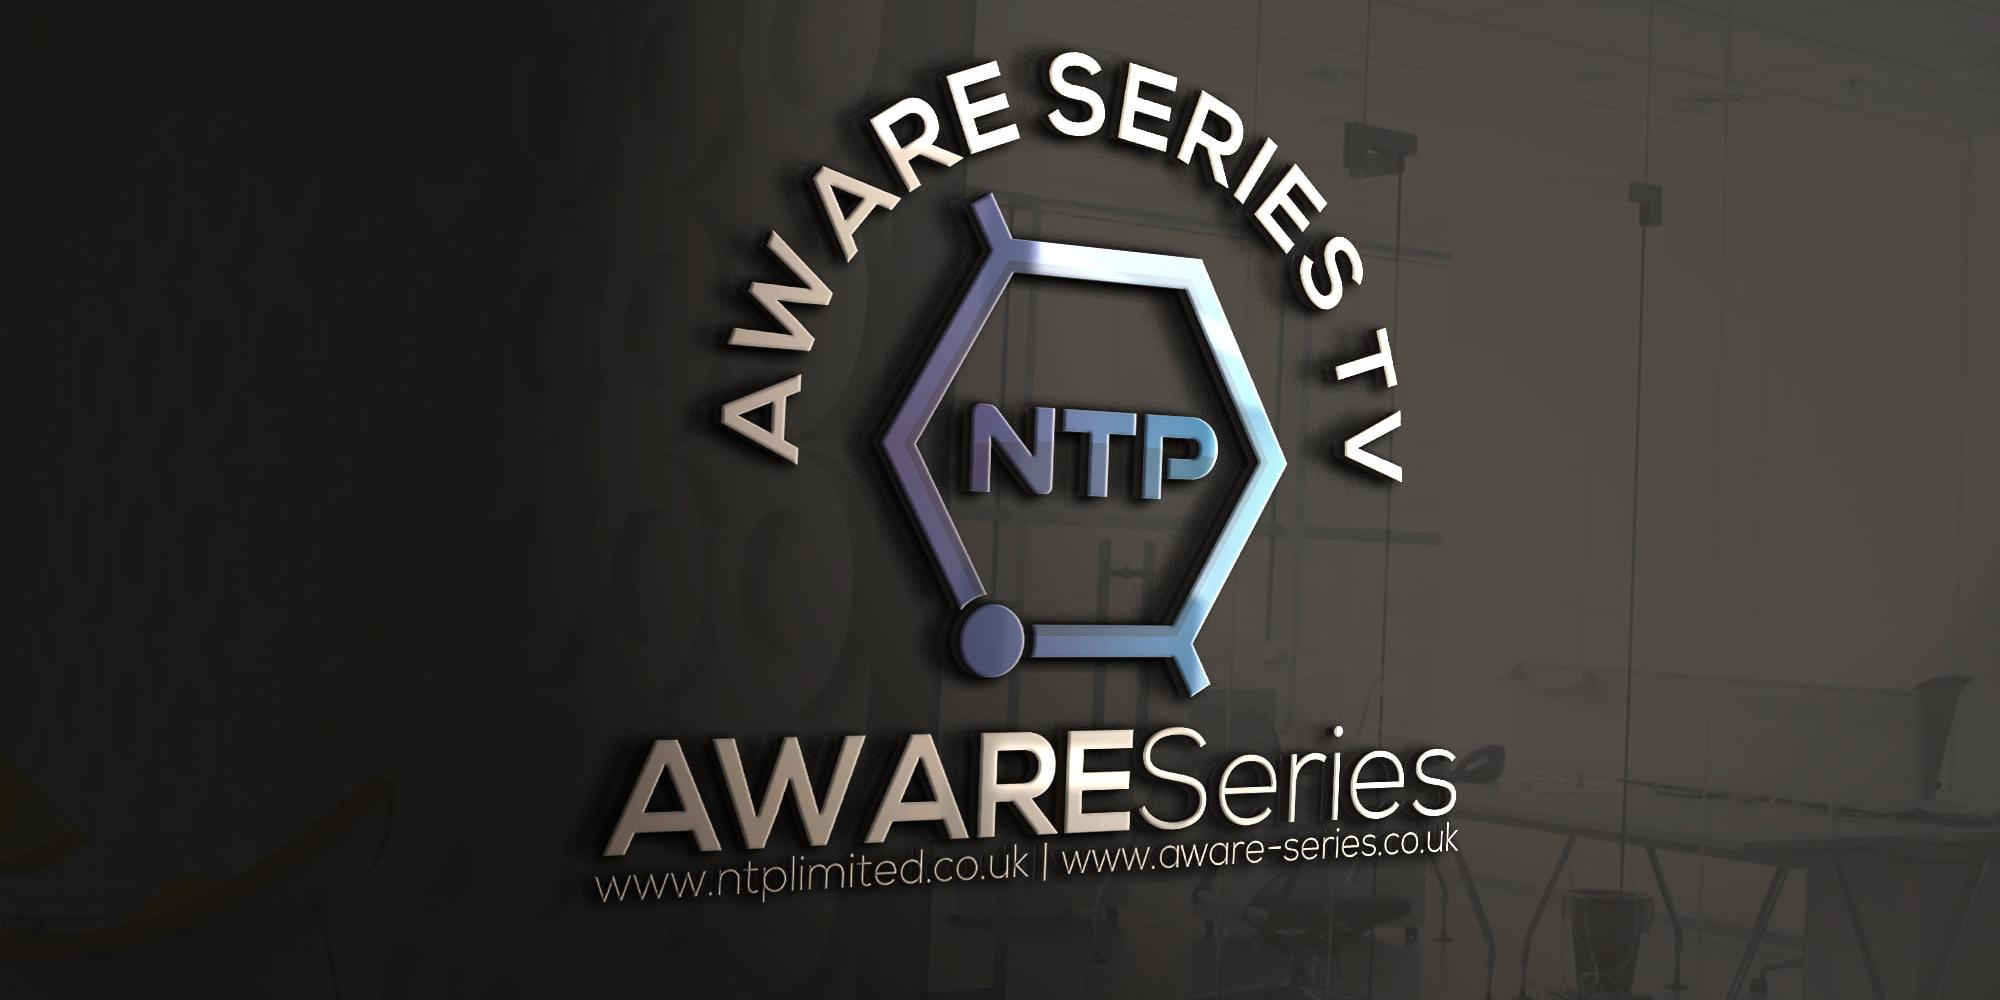 AWARE Series TV